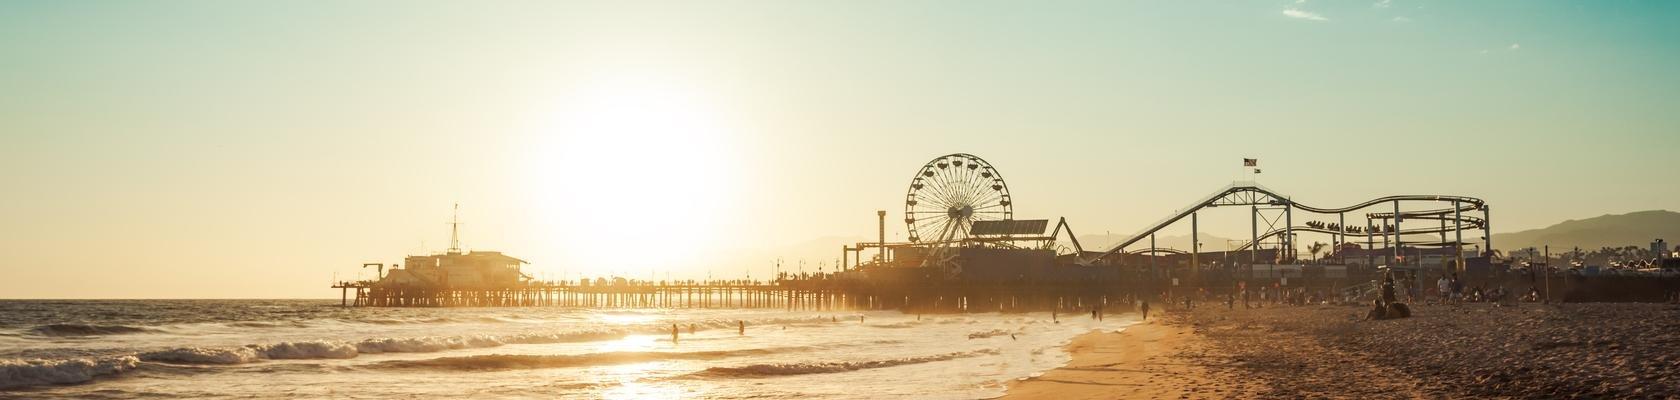 De pier van Santa Monica